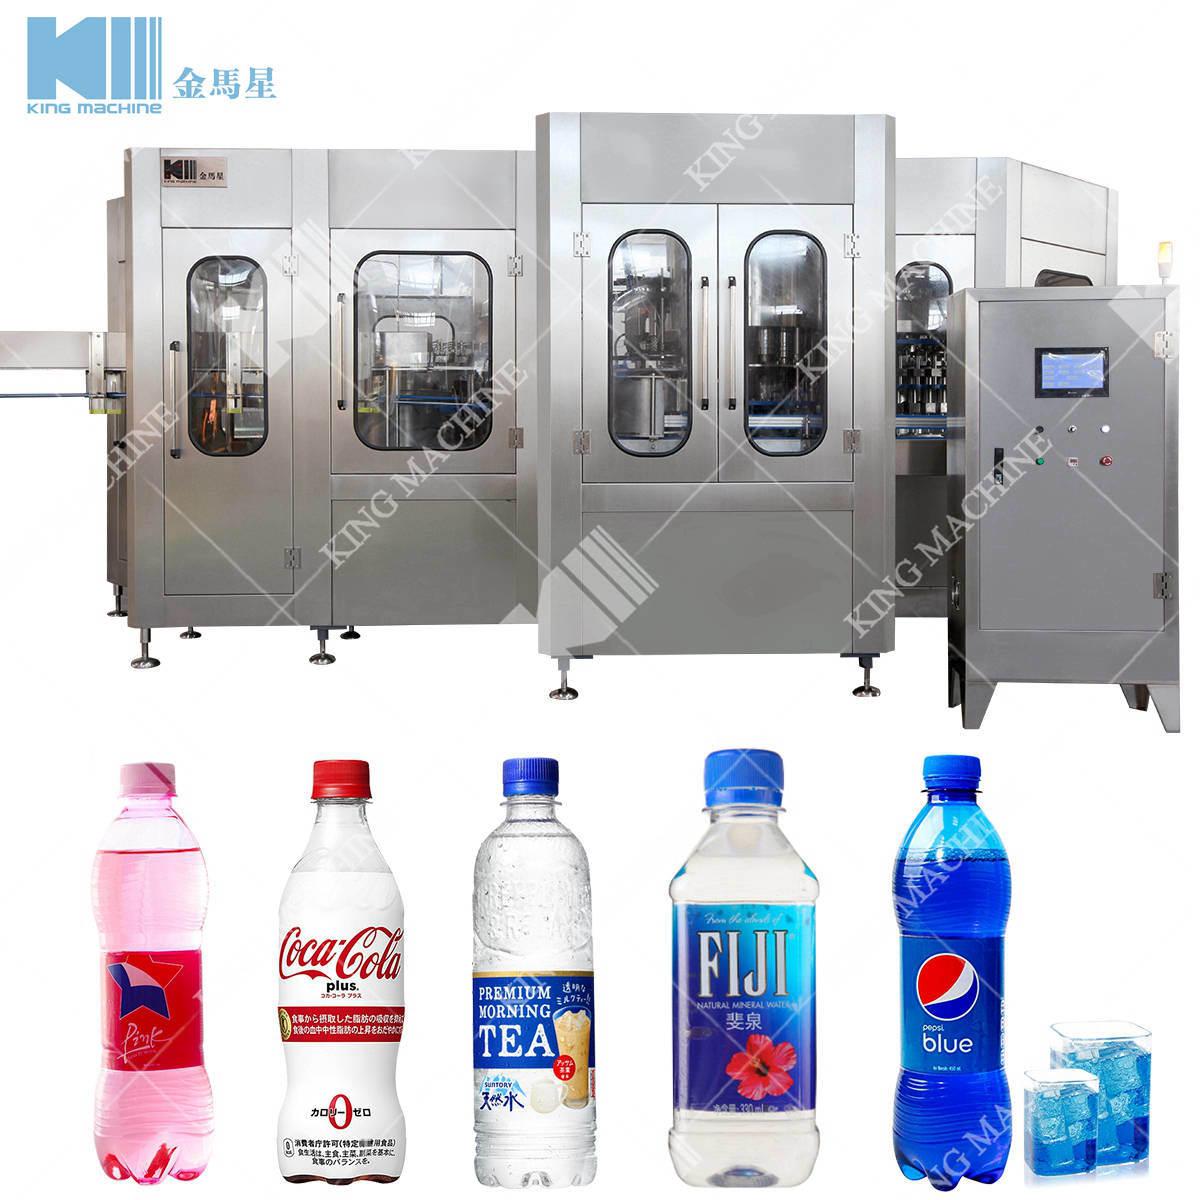 7 up Mirinda Apple Sidra Bottling Packing Machine Plant Price